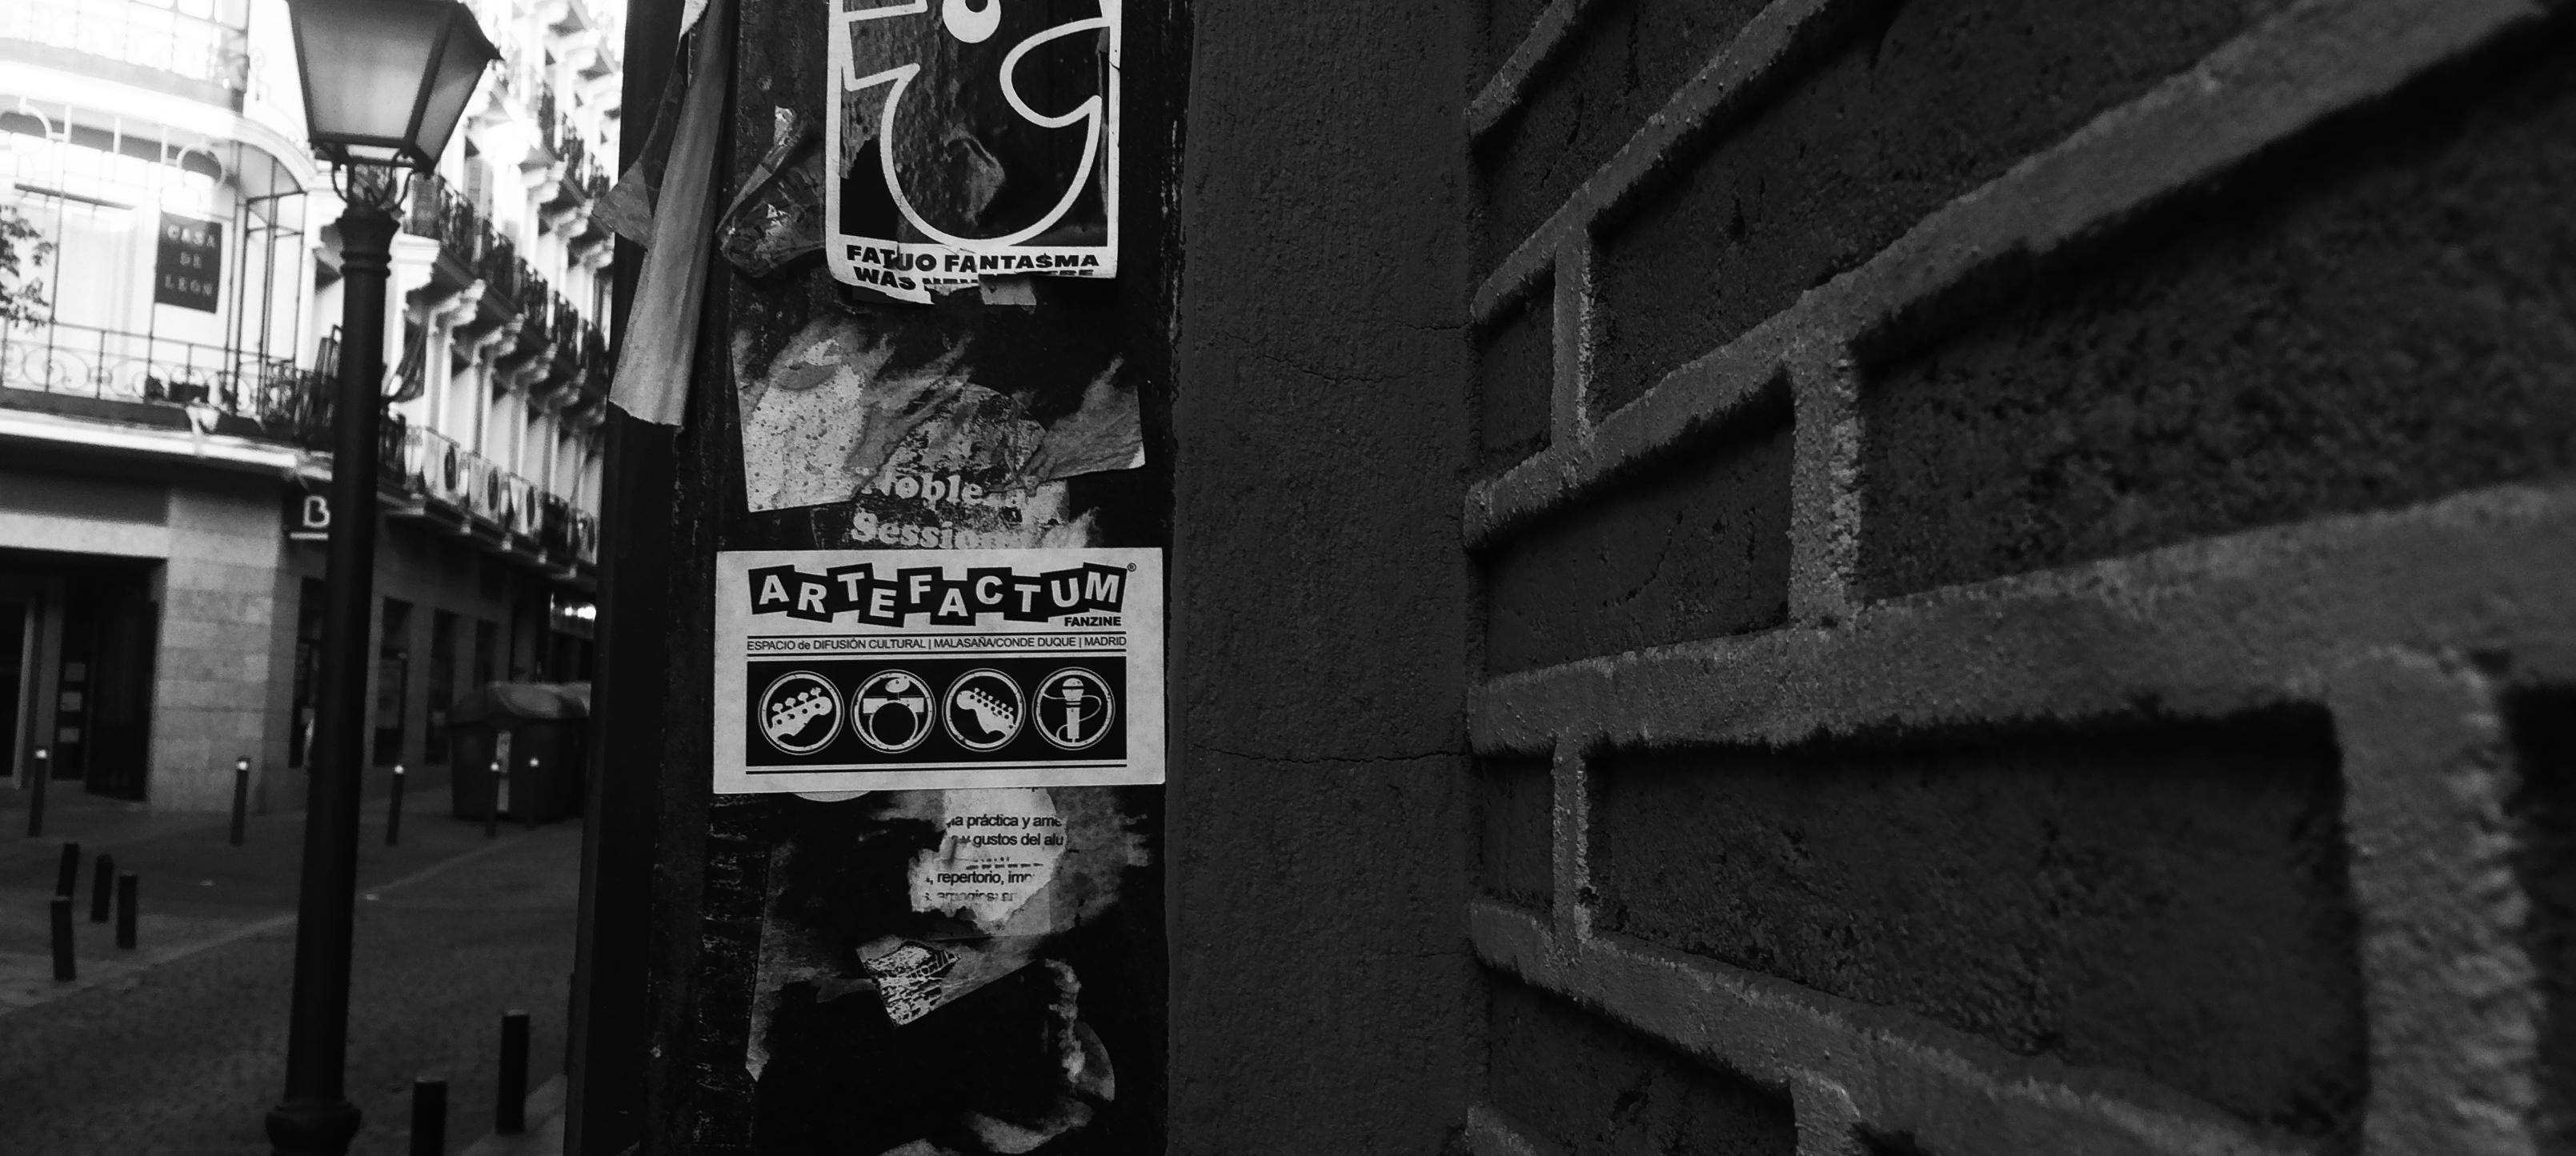 artefactum_street_Bw